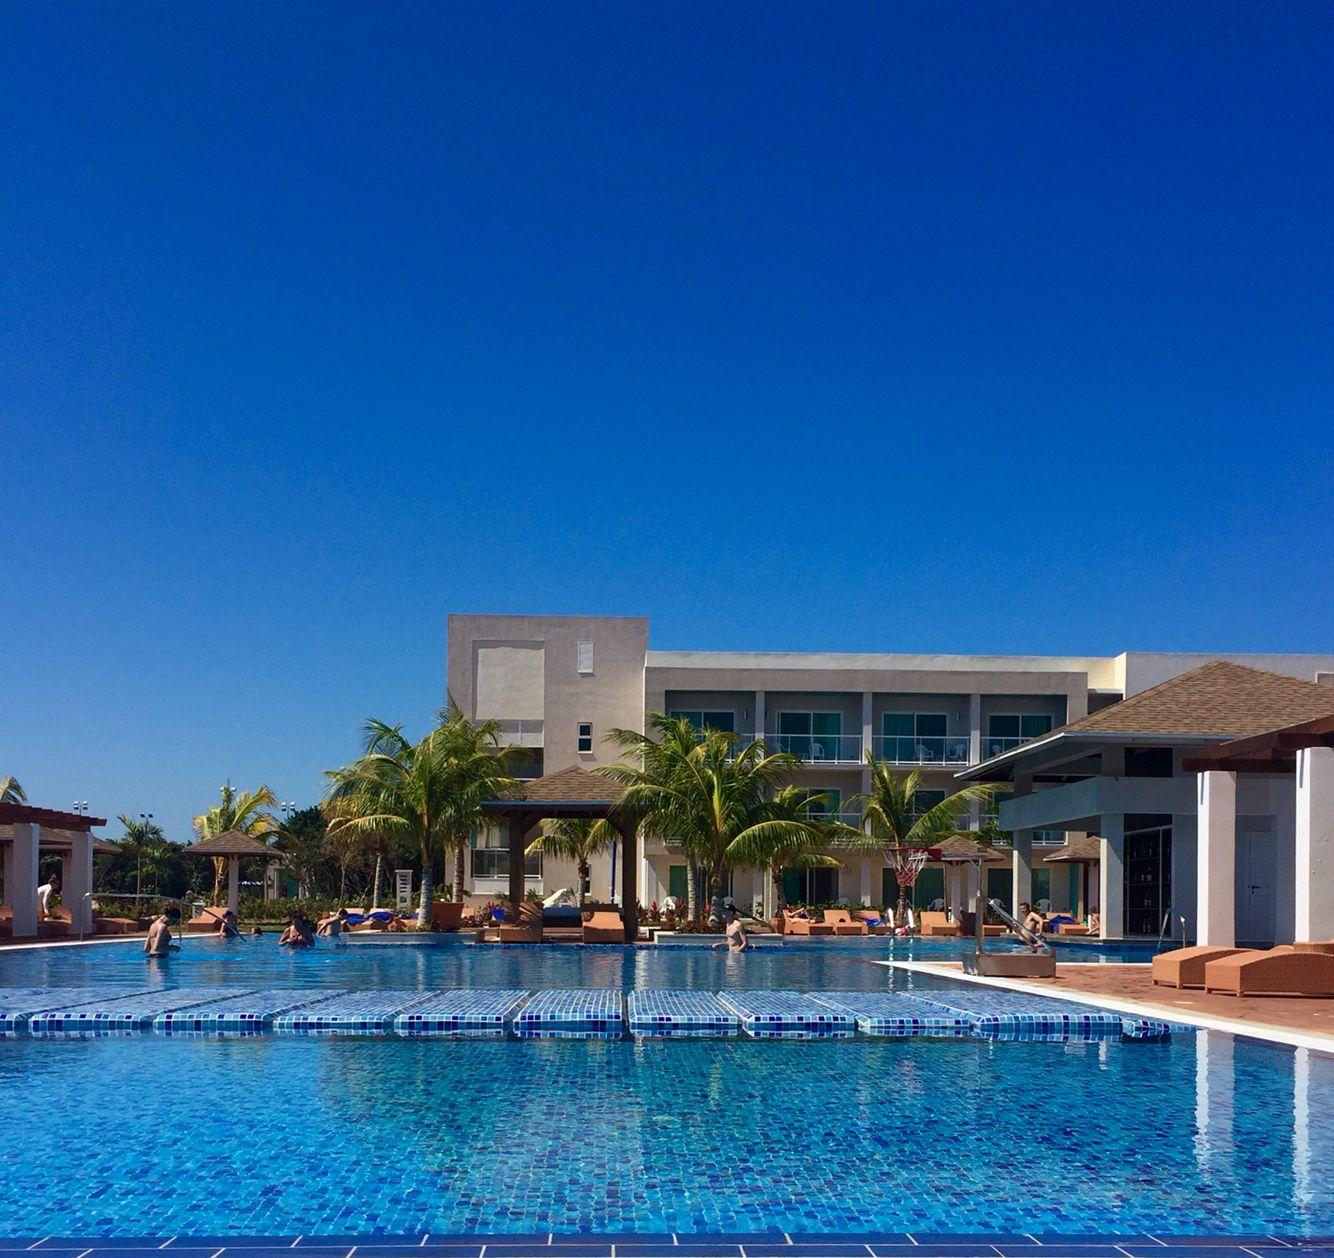 Ocean casa del mar hotel cayo santa maria cuba travel in 2019 santa maria cuba cuba cayo - Hotel casa del mar ...